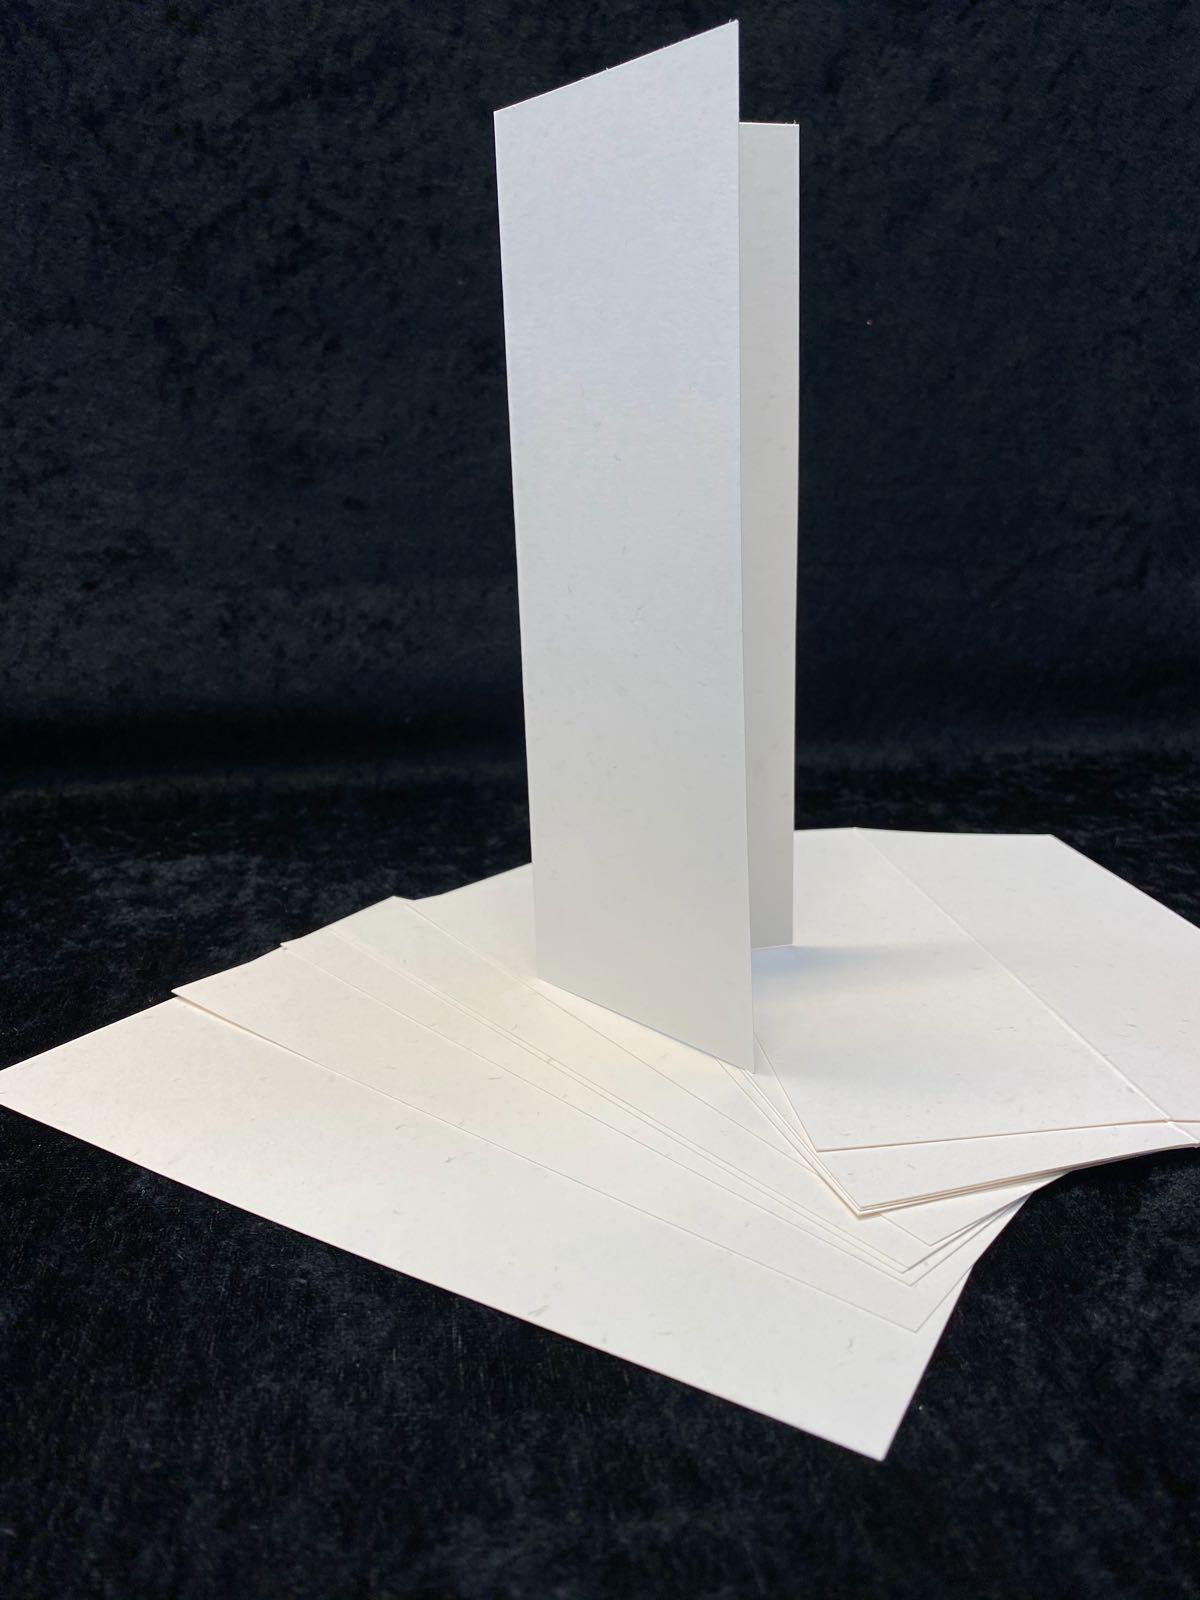 Slimcard base kremhvit med«sølvflak». TILBUD 10 stk kun kr. 25,-